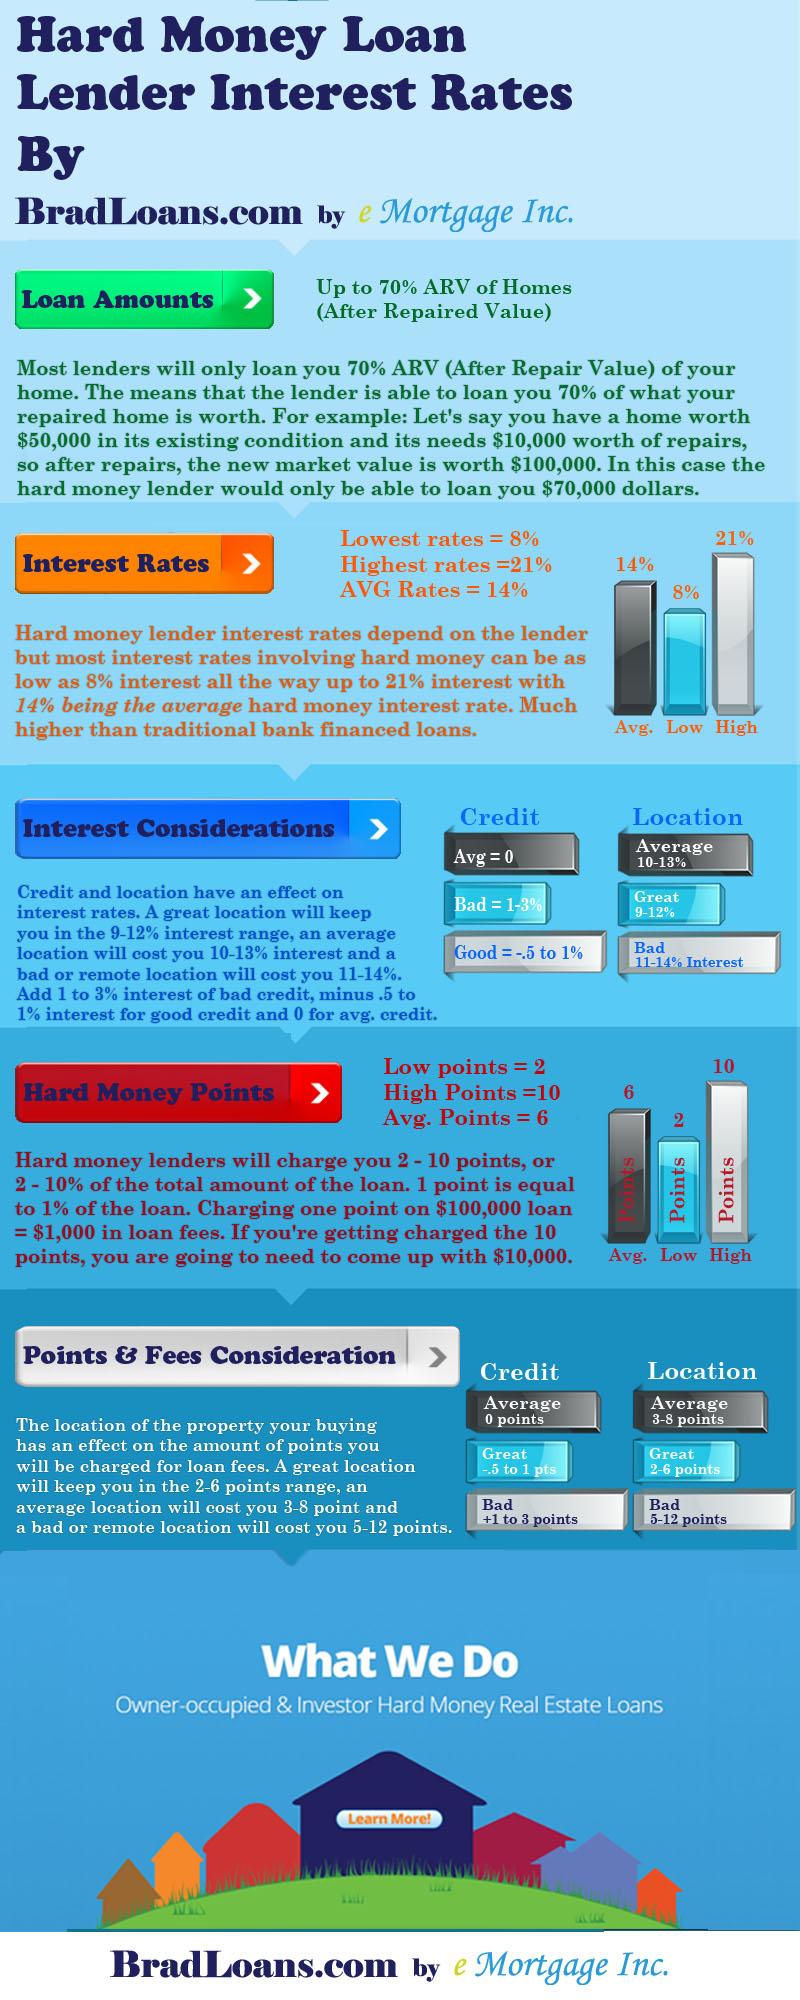 hard-money-lender-interest-rates-2015